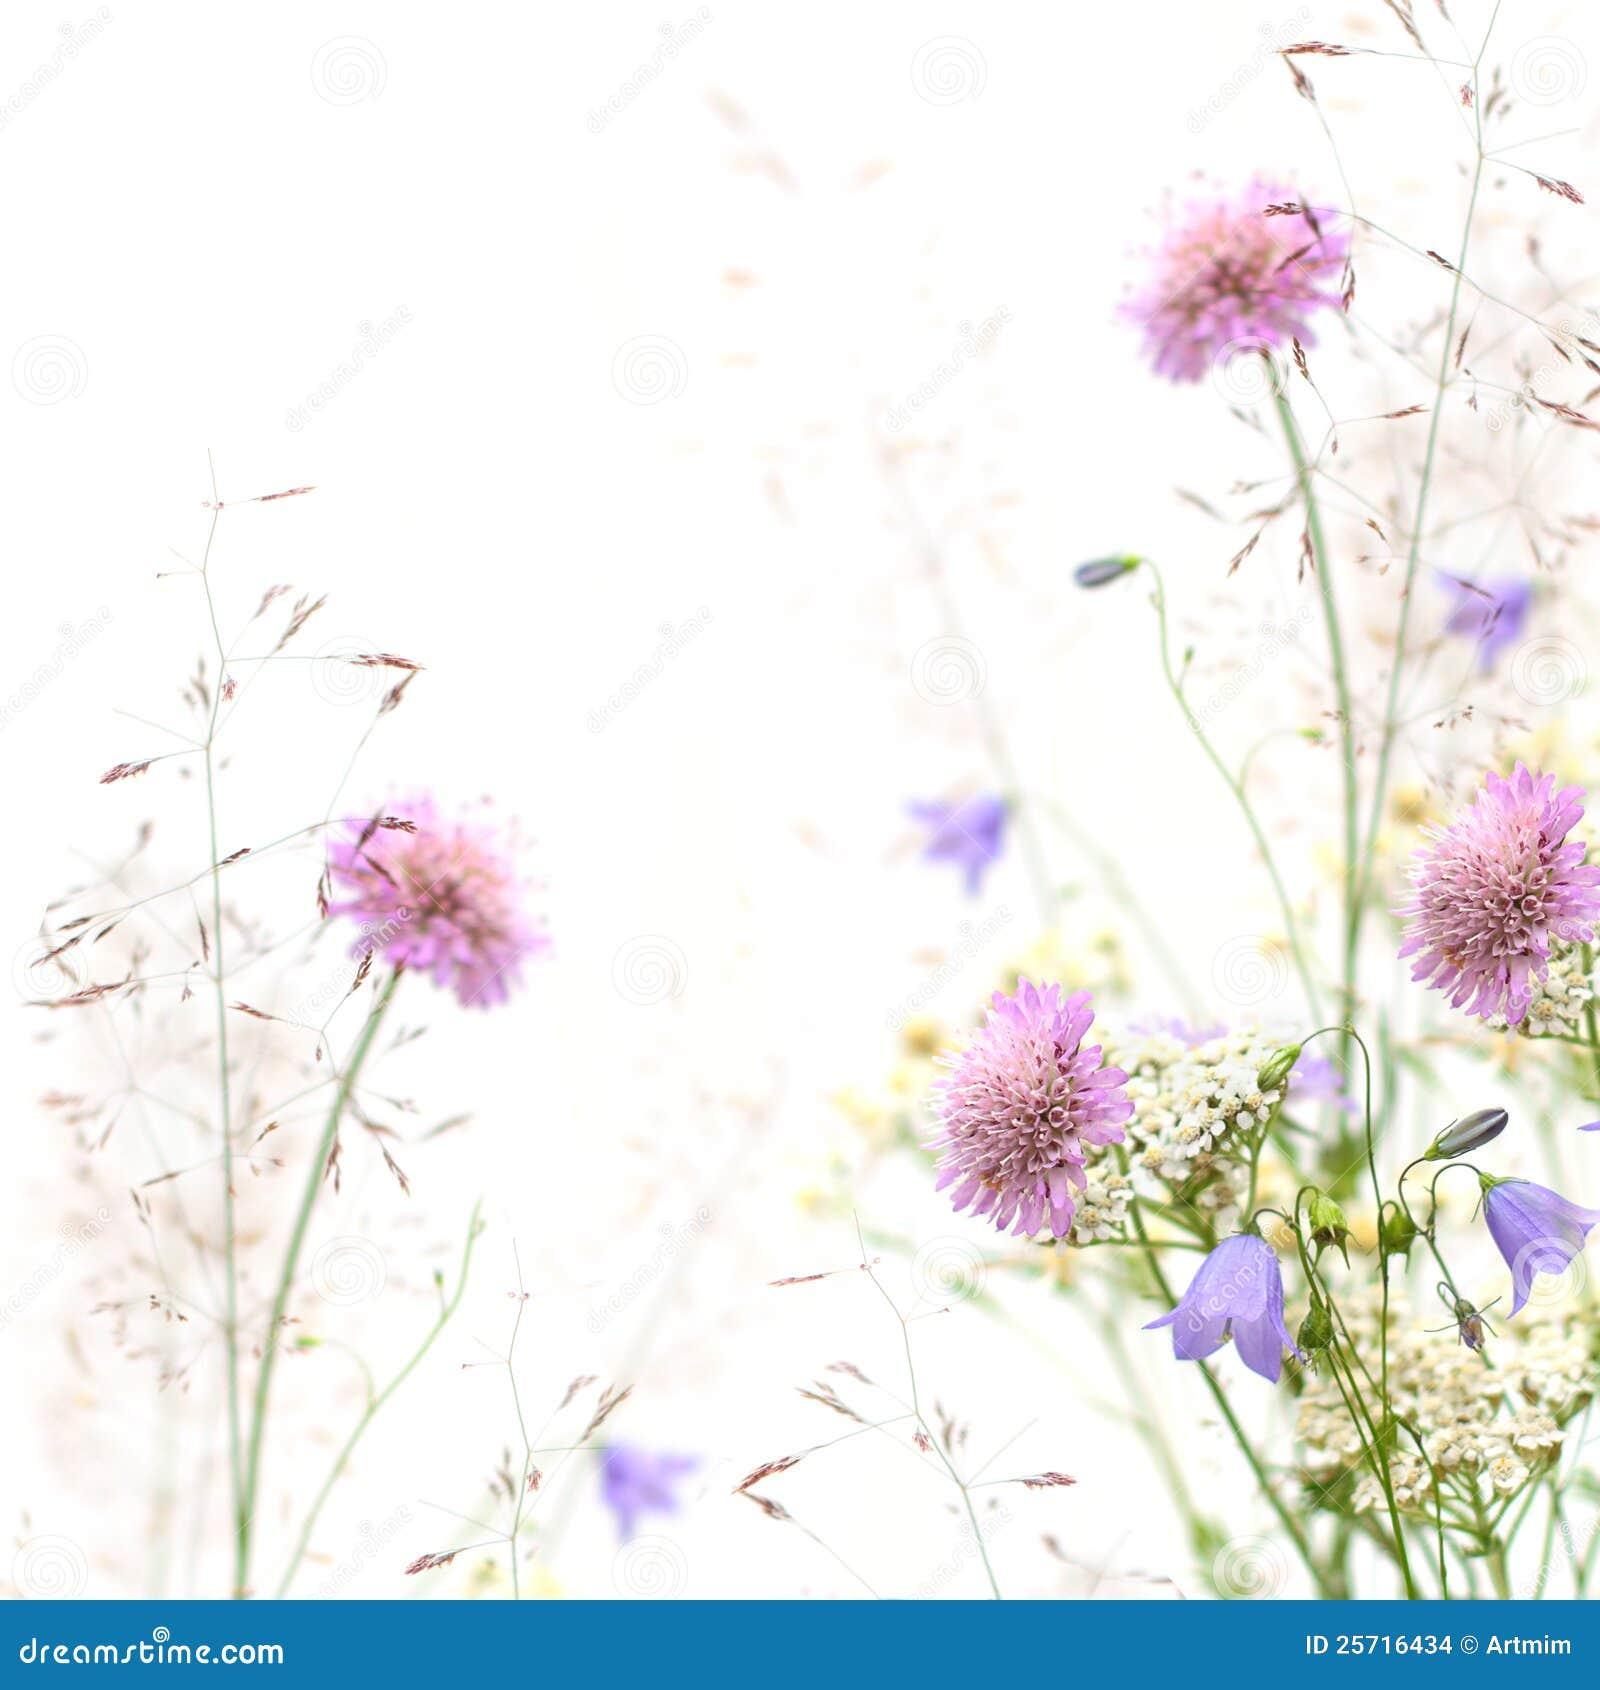 Flower frame spring or summer background stock photo image of download flower frame spring or summer background stock photo image of gift border mightylinksfo